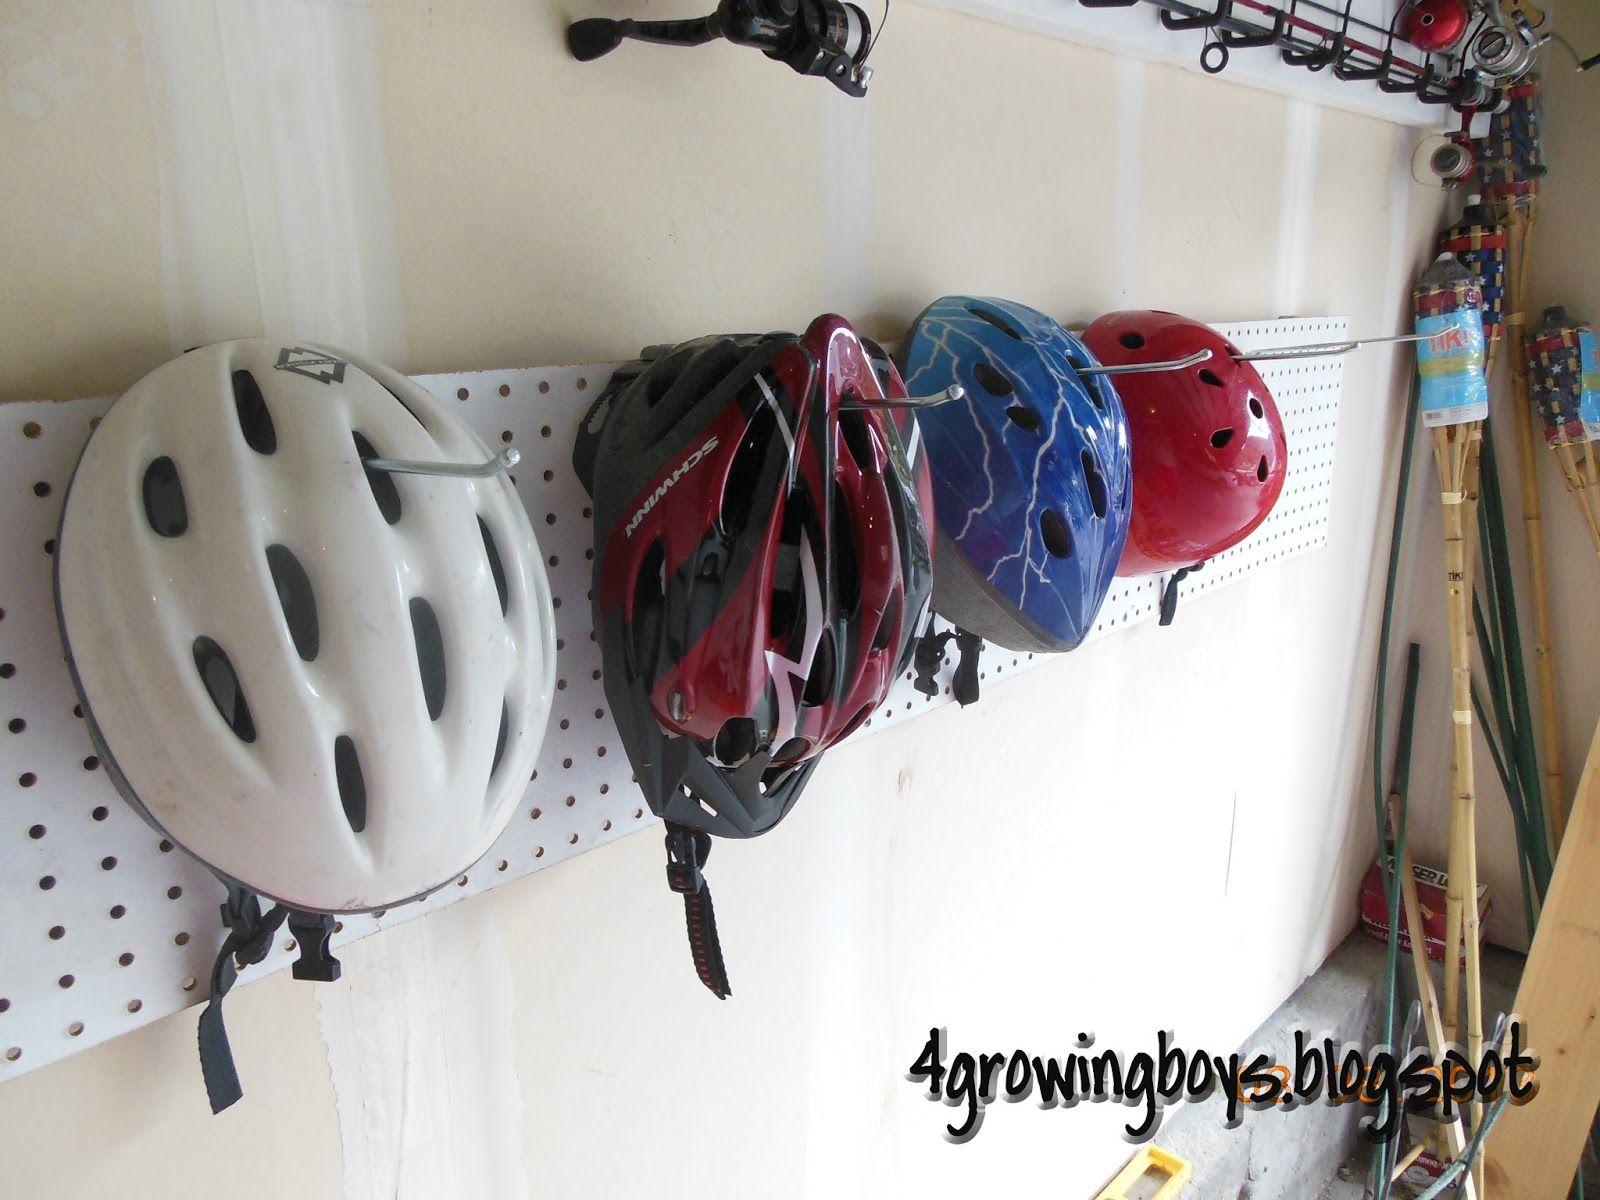 4 Growing Boys: Bike Helmet Organizing Rack Made From Pegboard